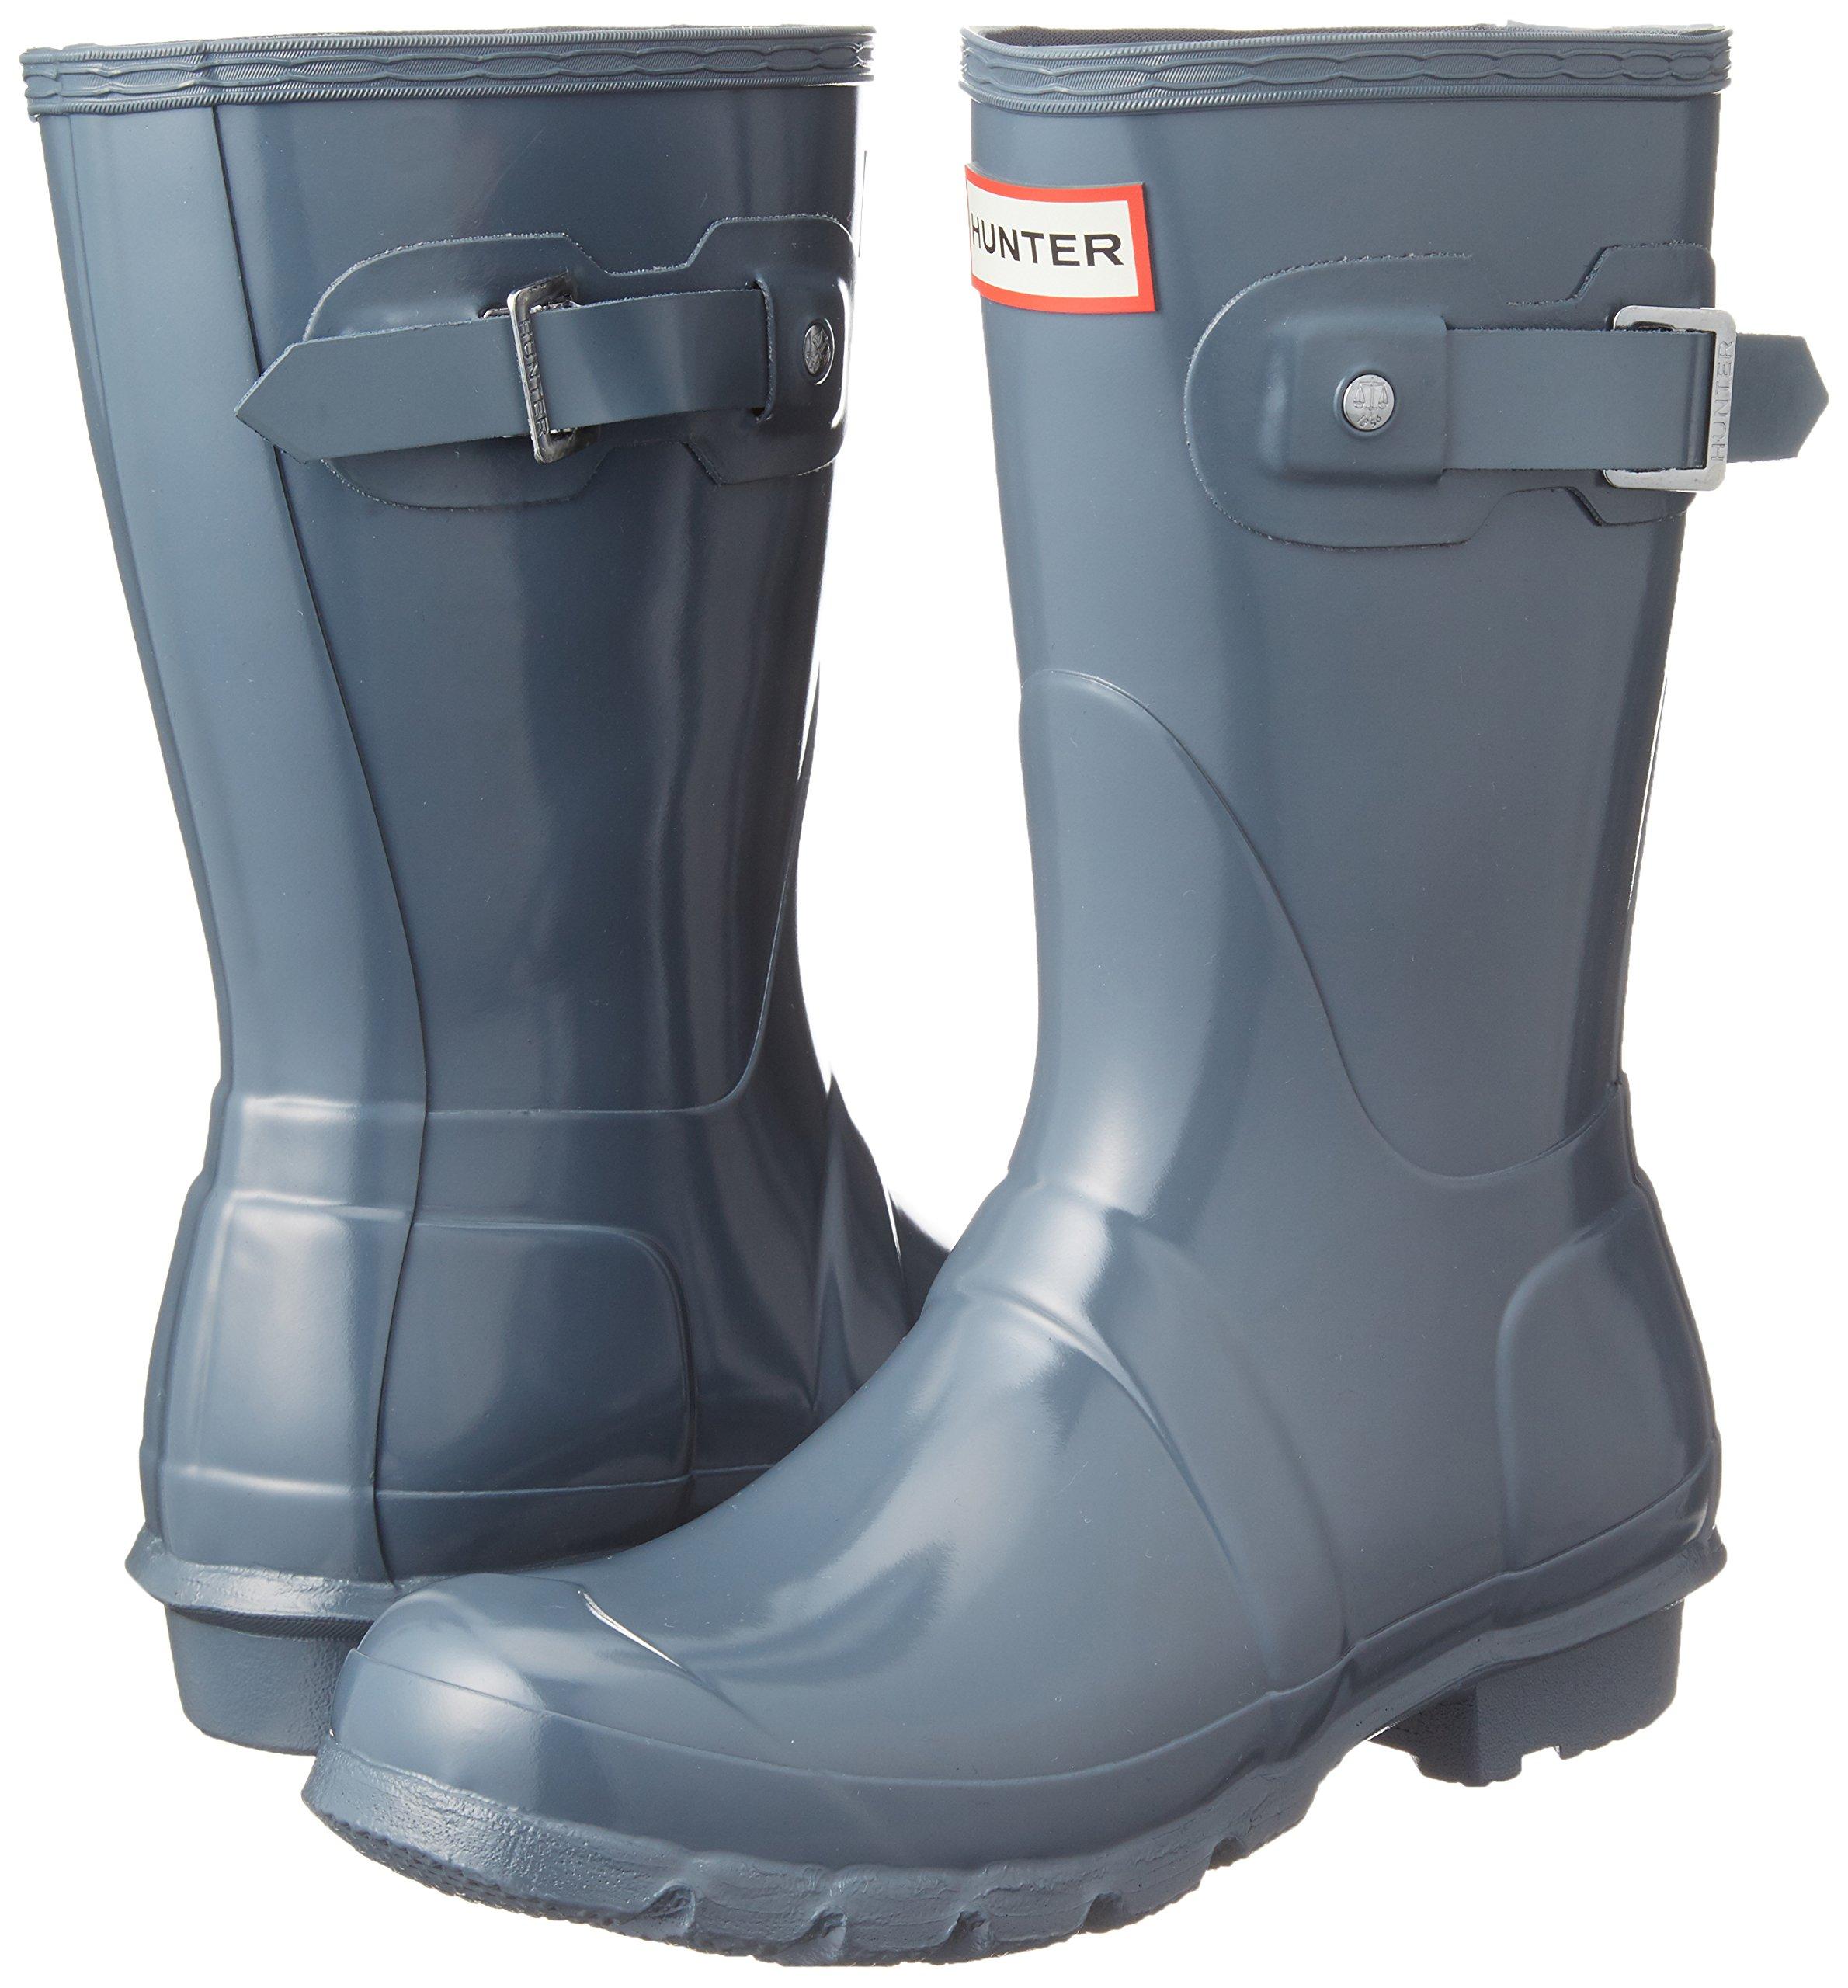 Hunter-WFS1000RGL-Women-039-s-Original-Short-Gloss-Boots-All-Colors thumbnail 16